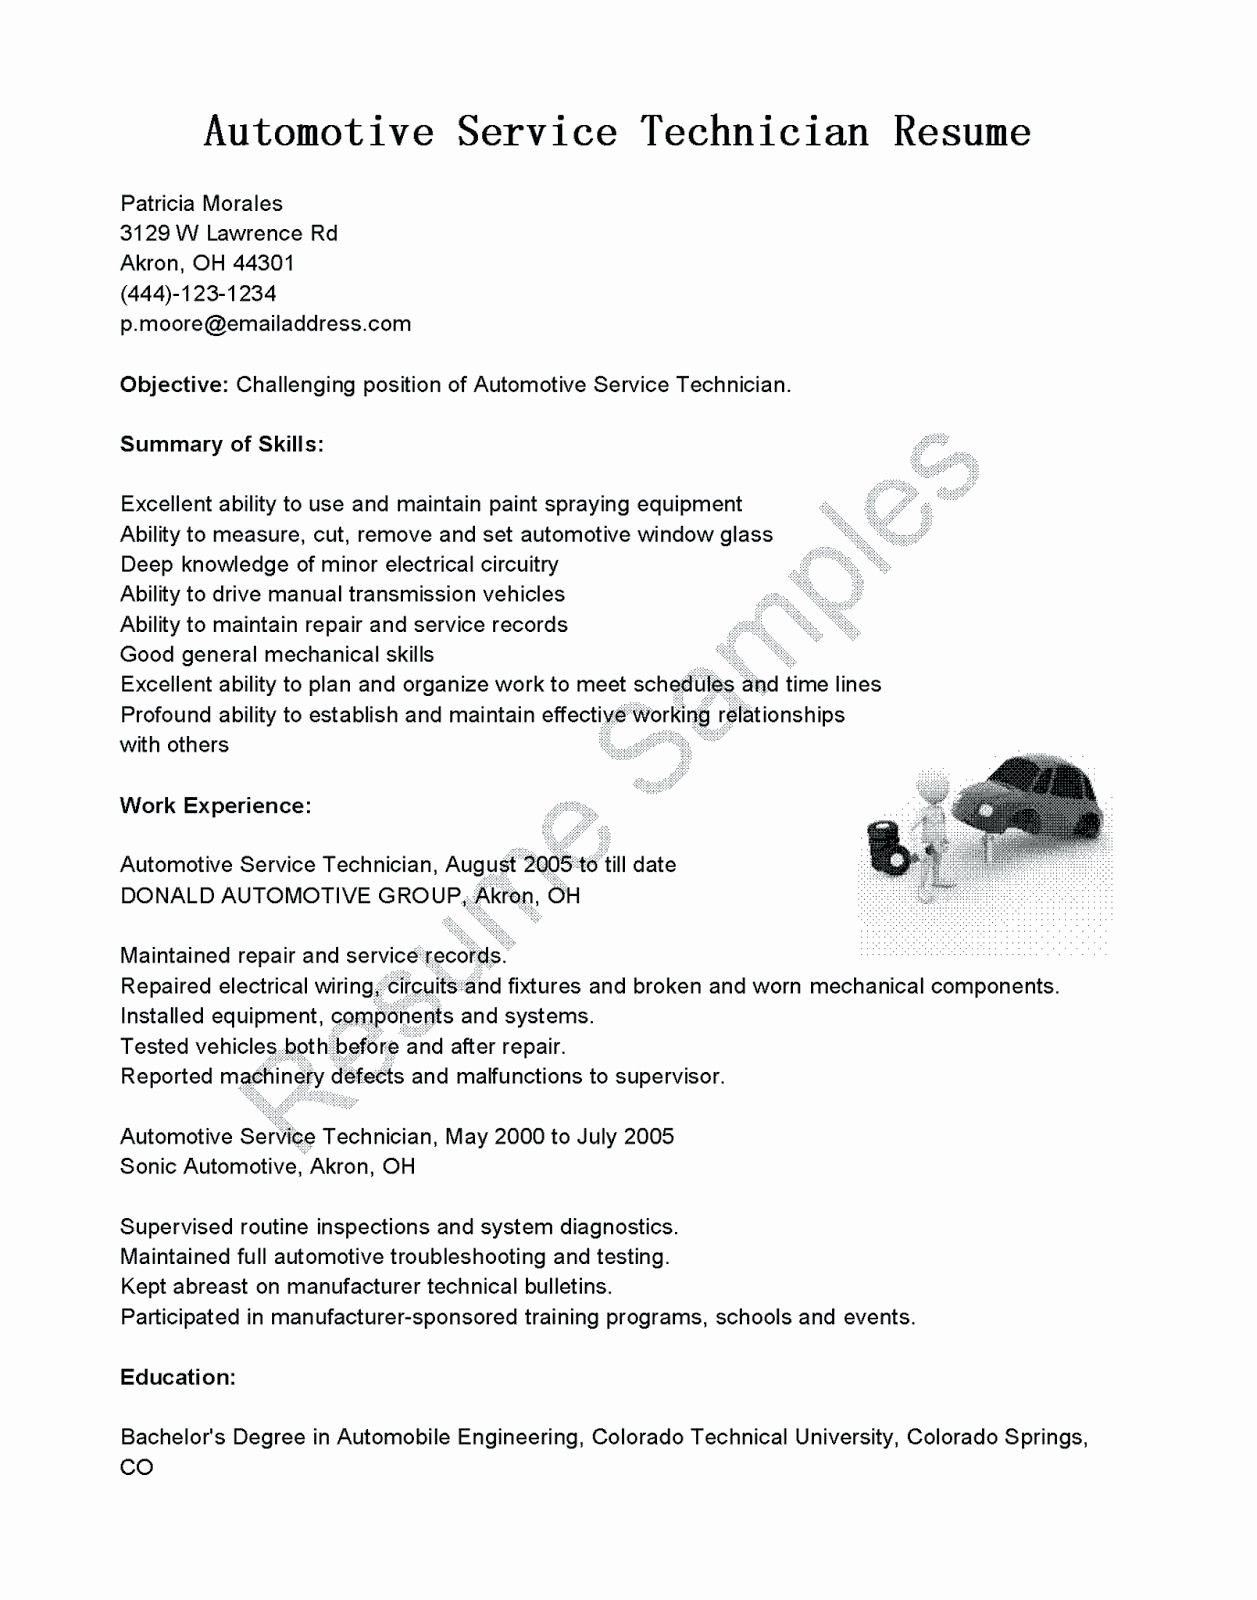 Unique Resume and Template Fabulous Auto Technician Resume